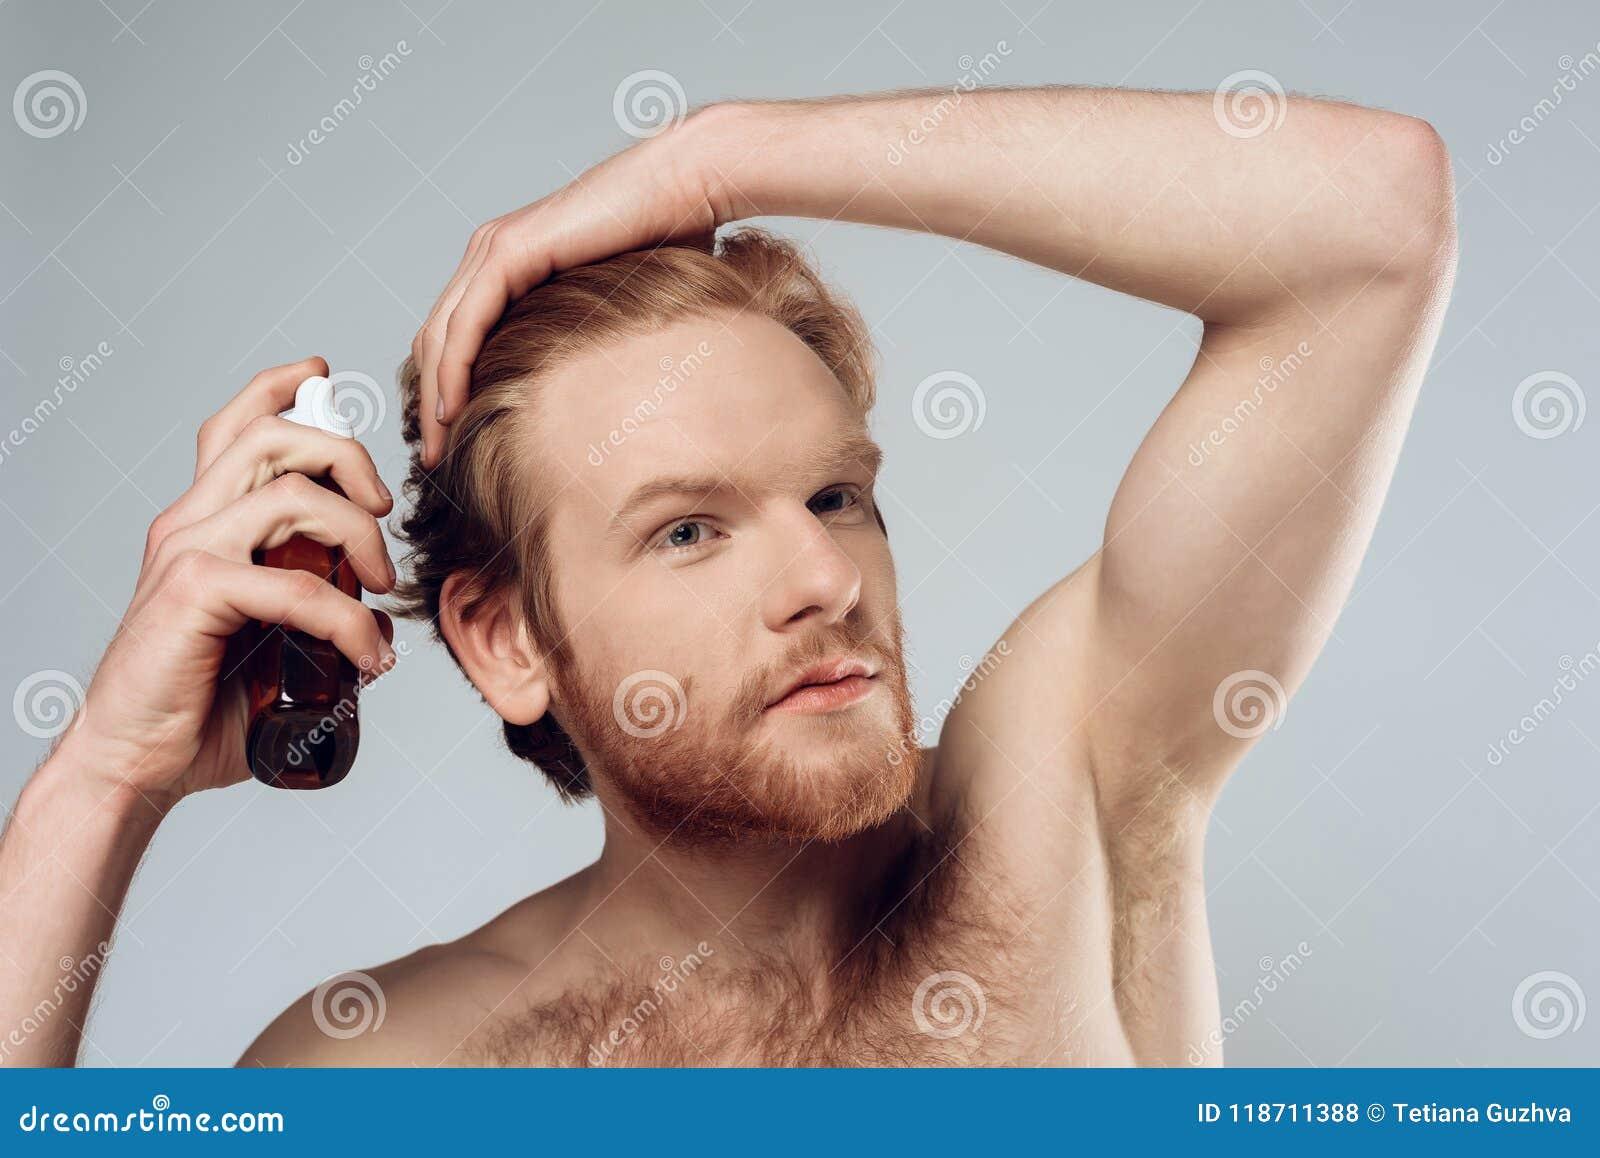 Nude wet pussy pskistani